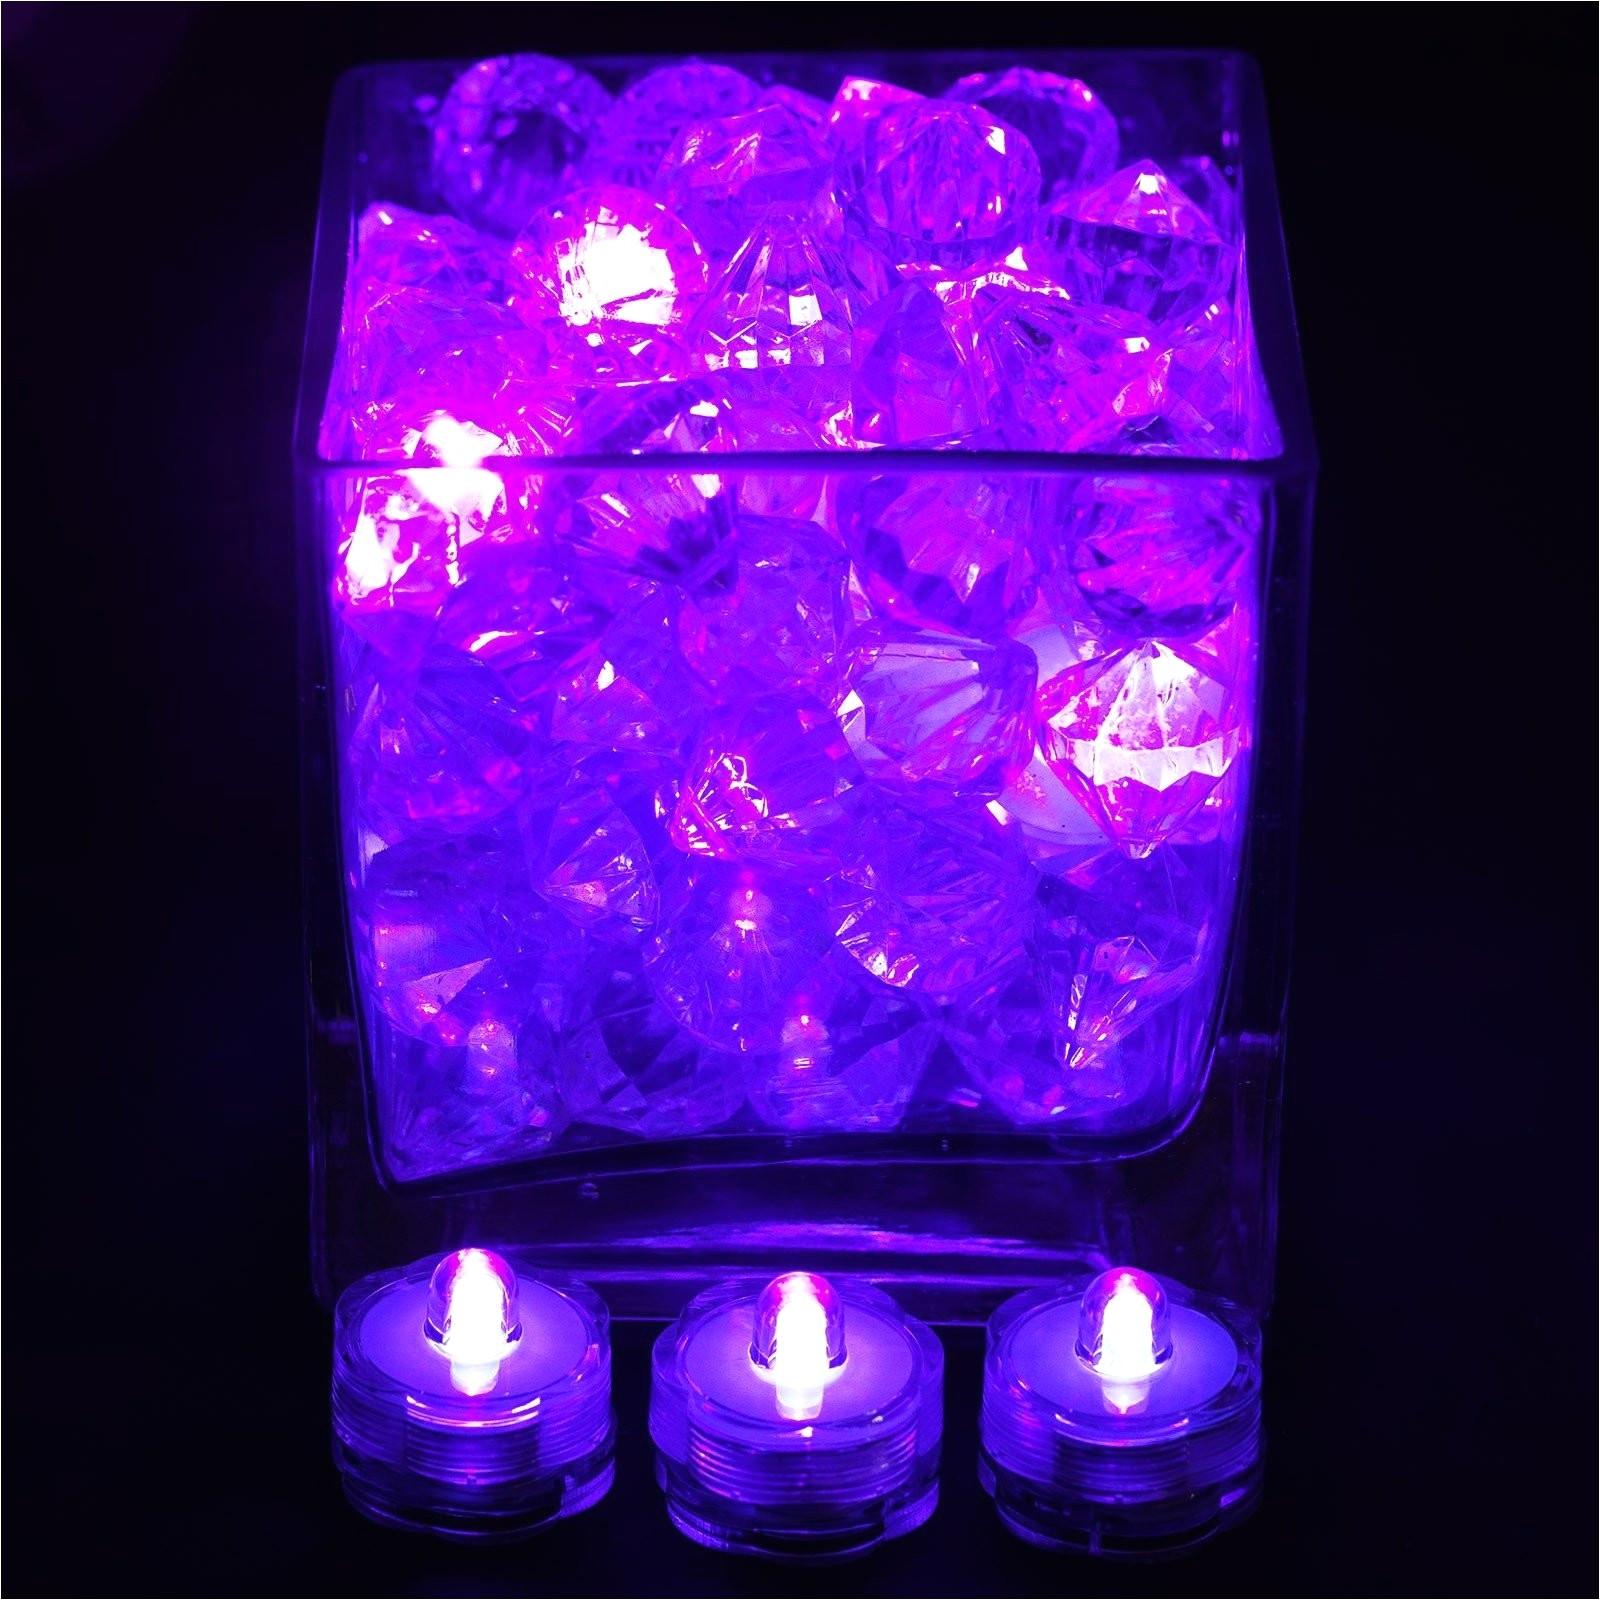 bathroom led lighting new vases waterproof vase lights i 0d led